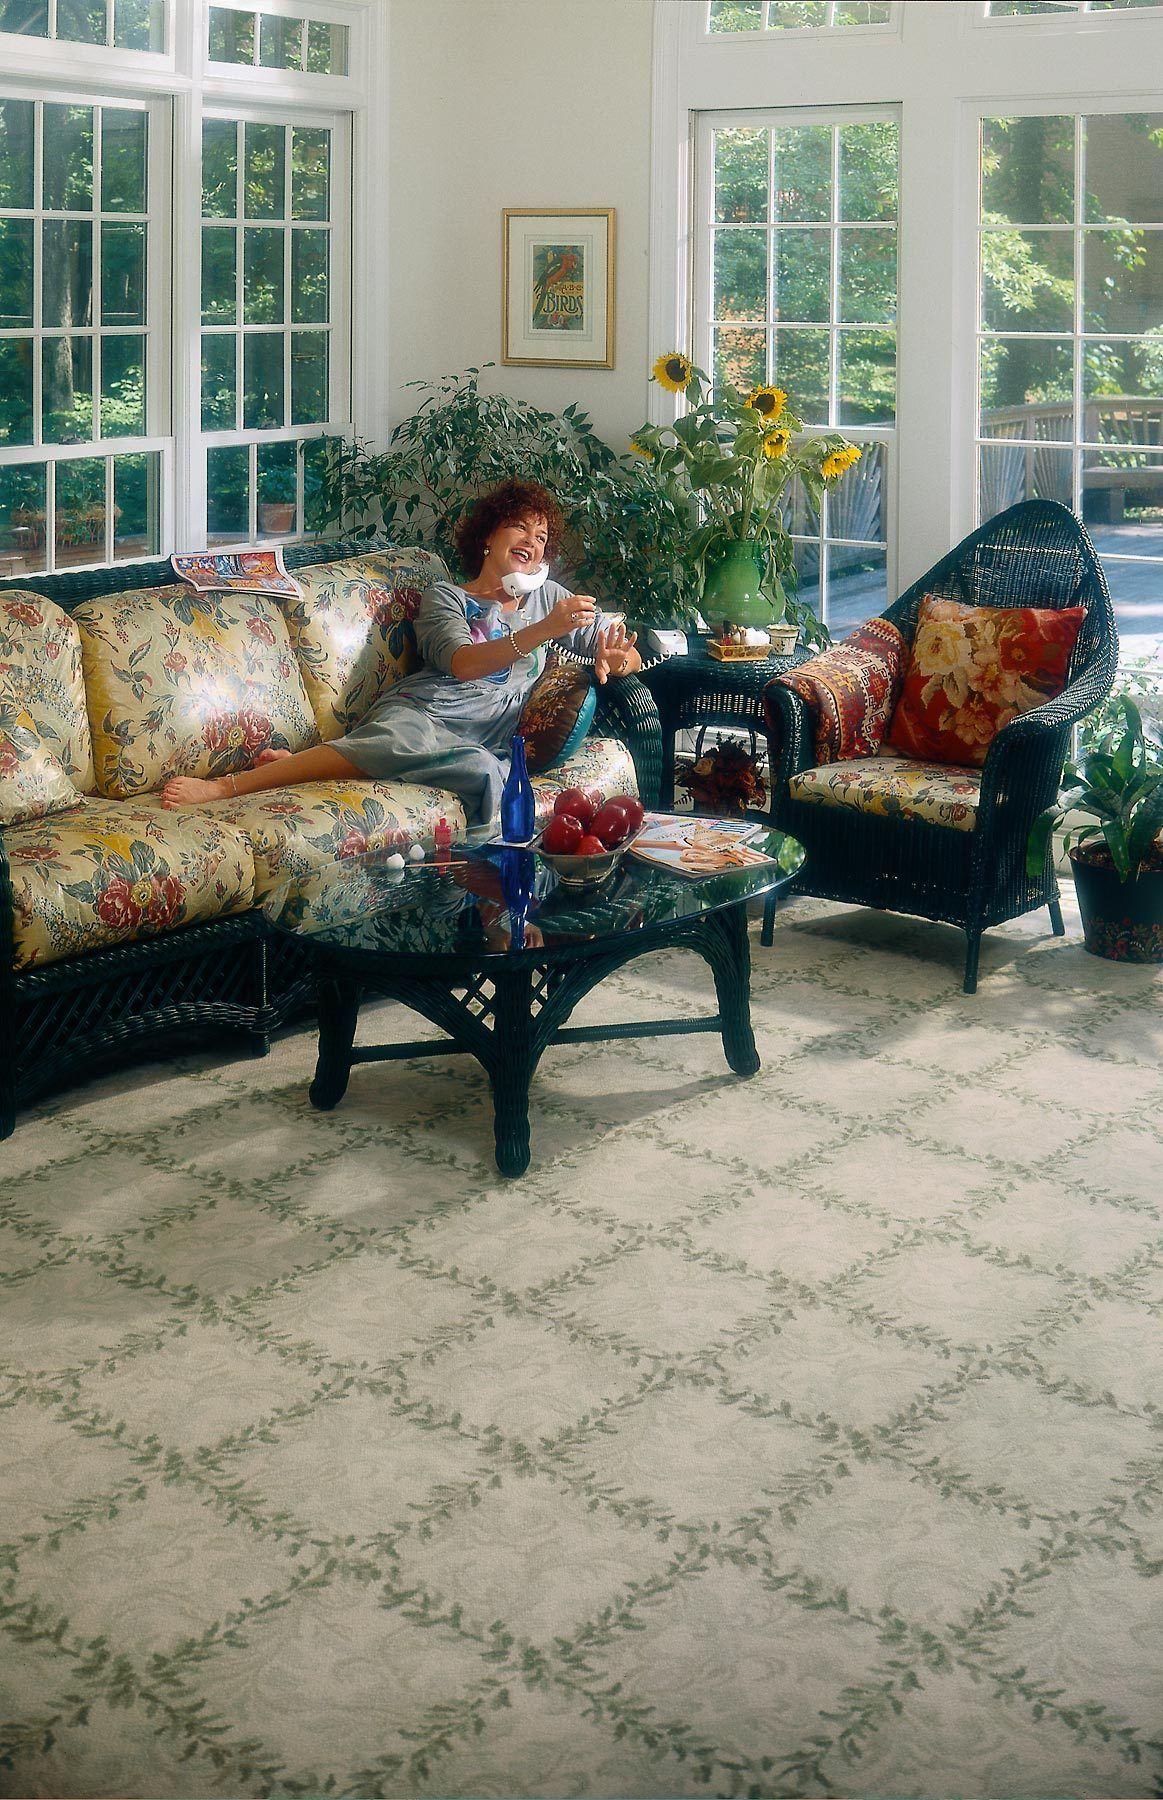 1shaw__woman__on_sofa.jpg